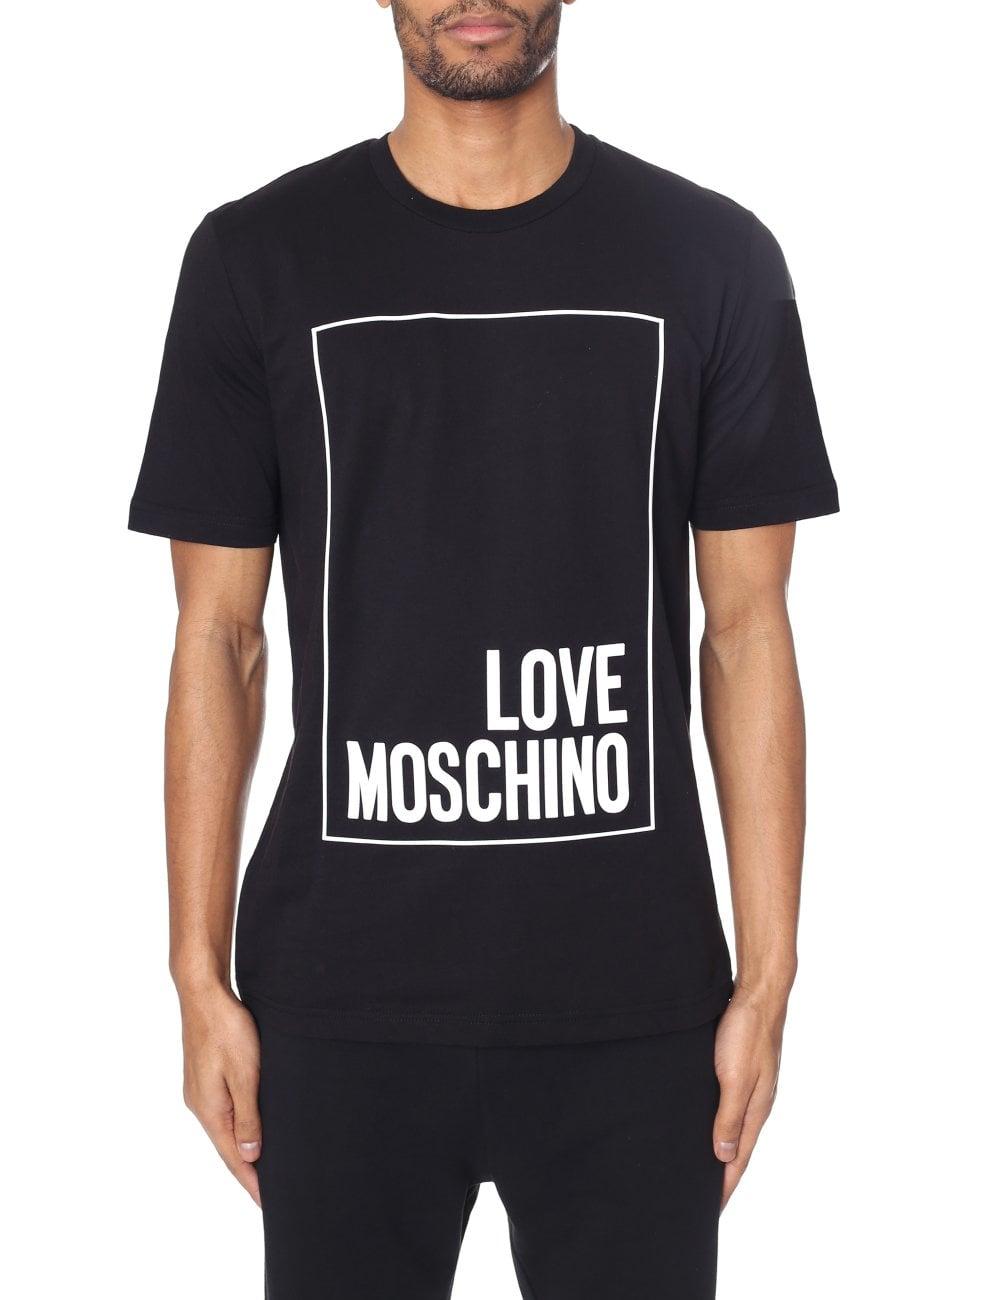 b82704252353a Love Moschino Men's Box Logo Tee